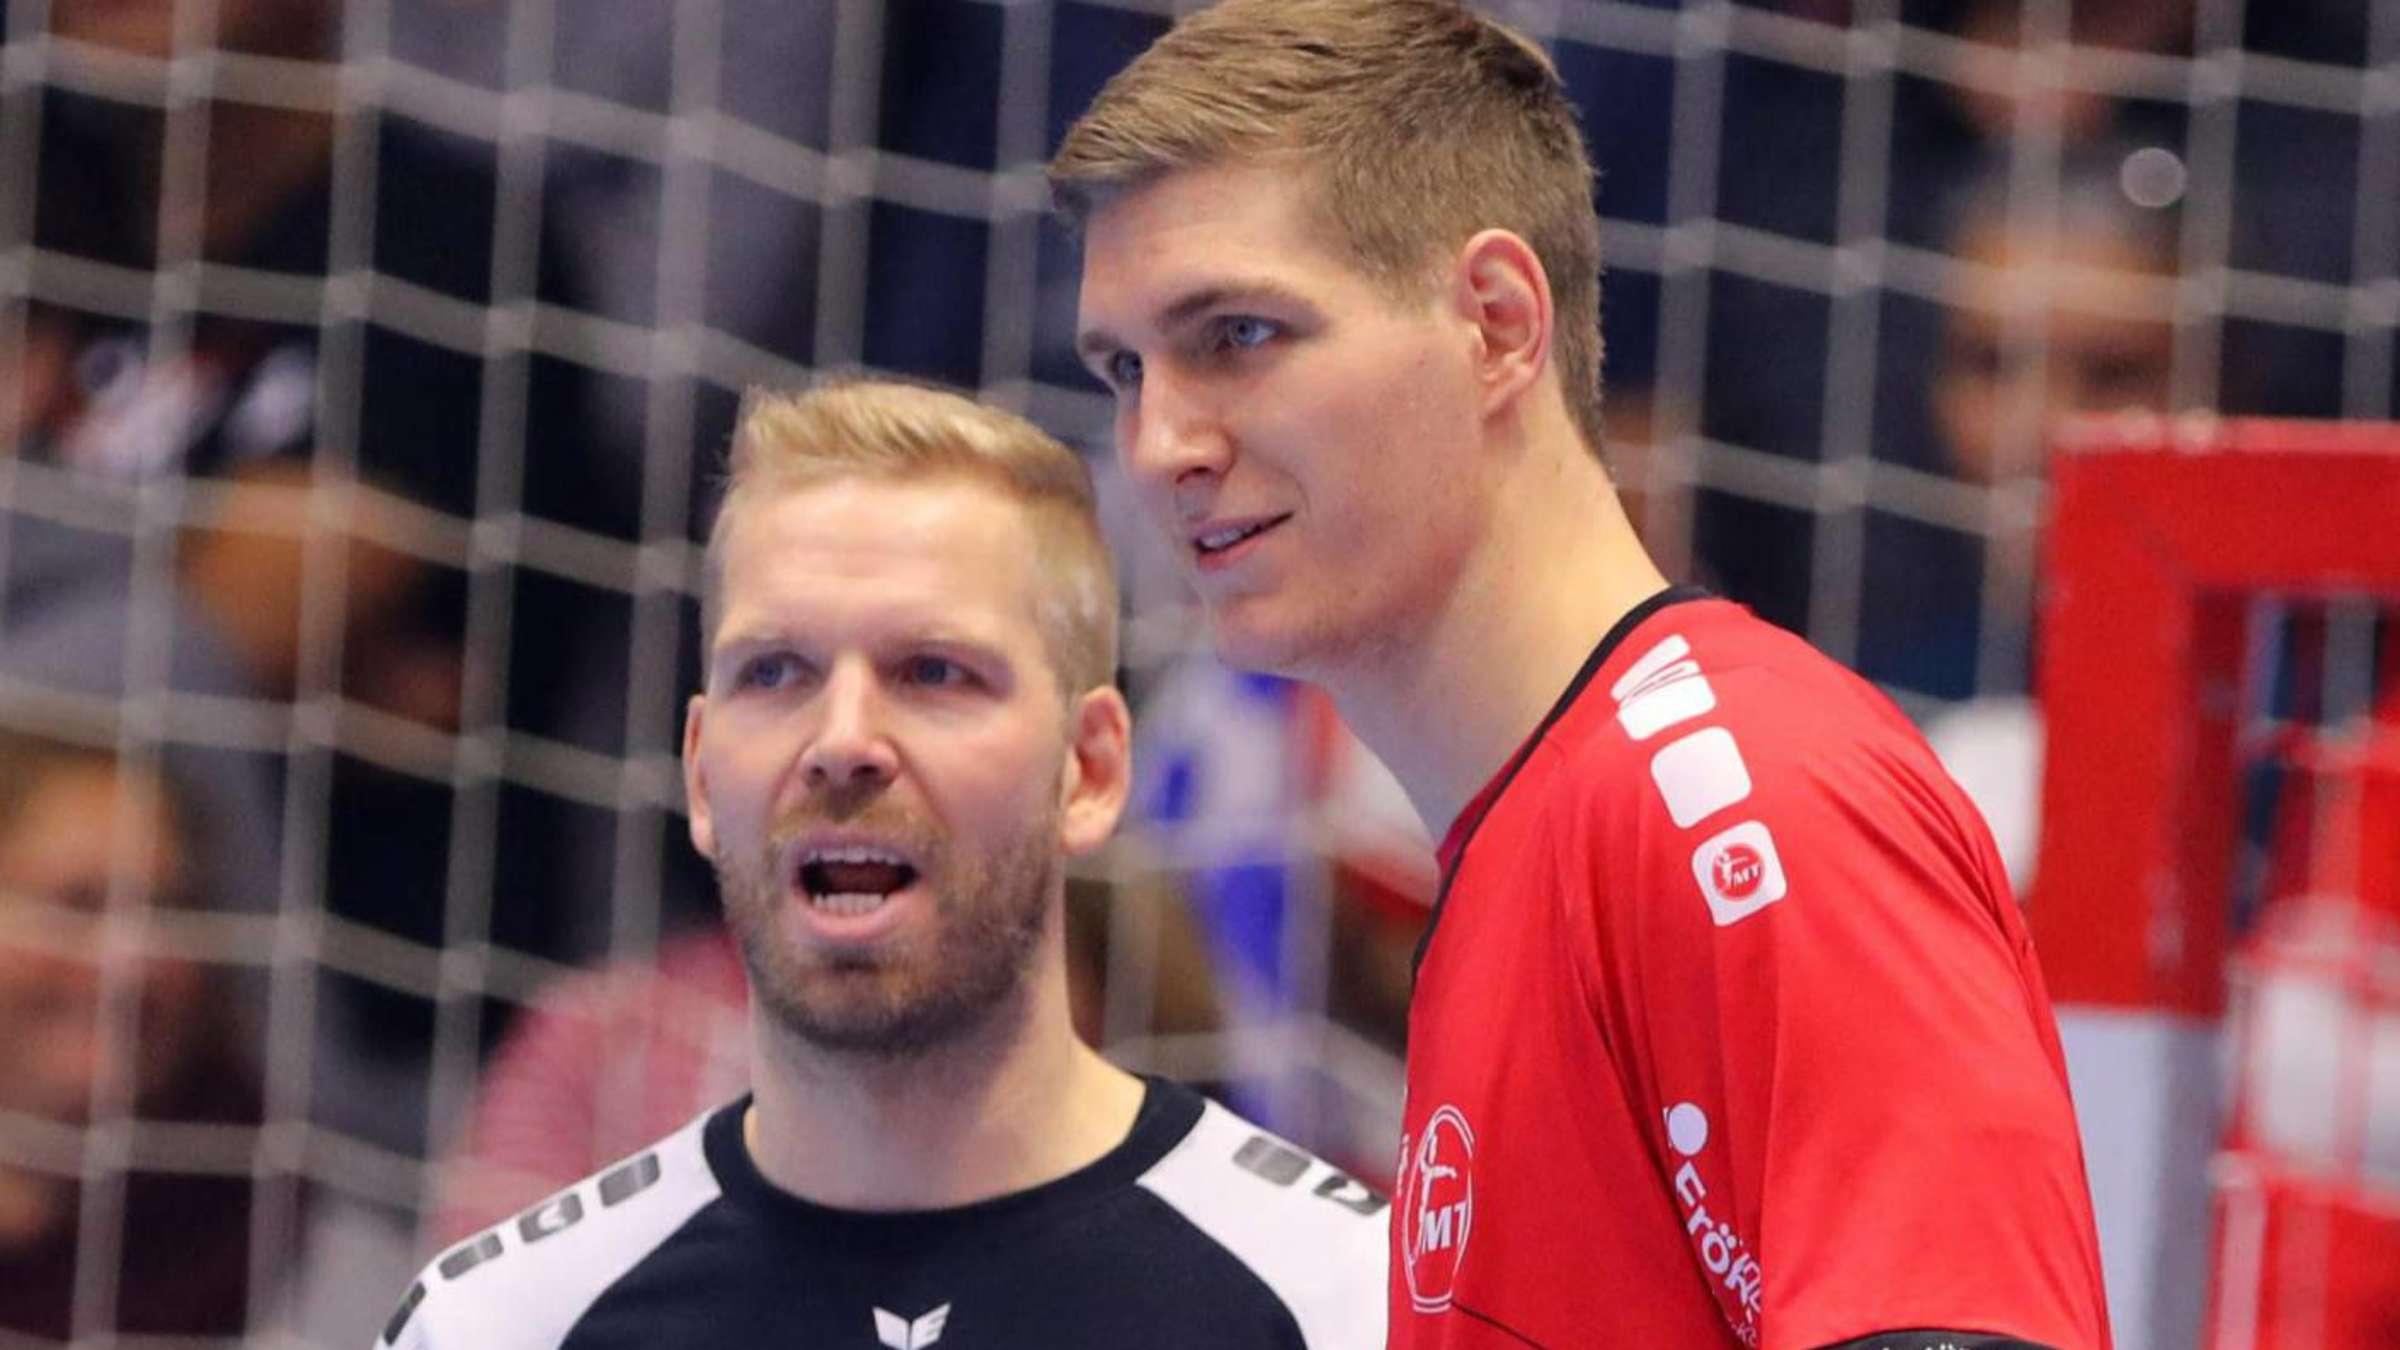 Handball Bundesligist Mt Melsungen Kapitan Finn Lemke Im